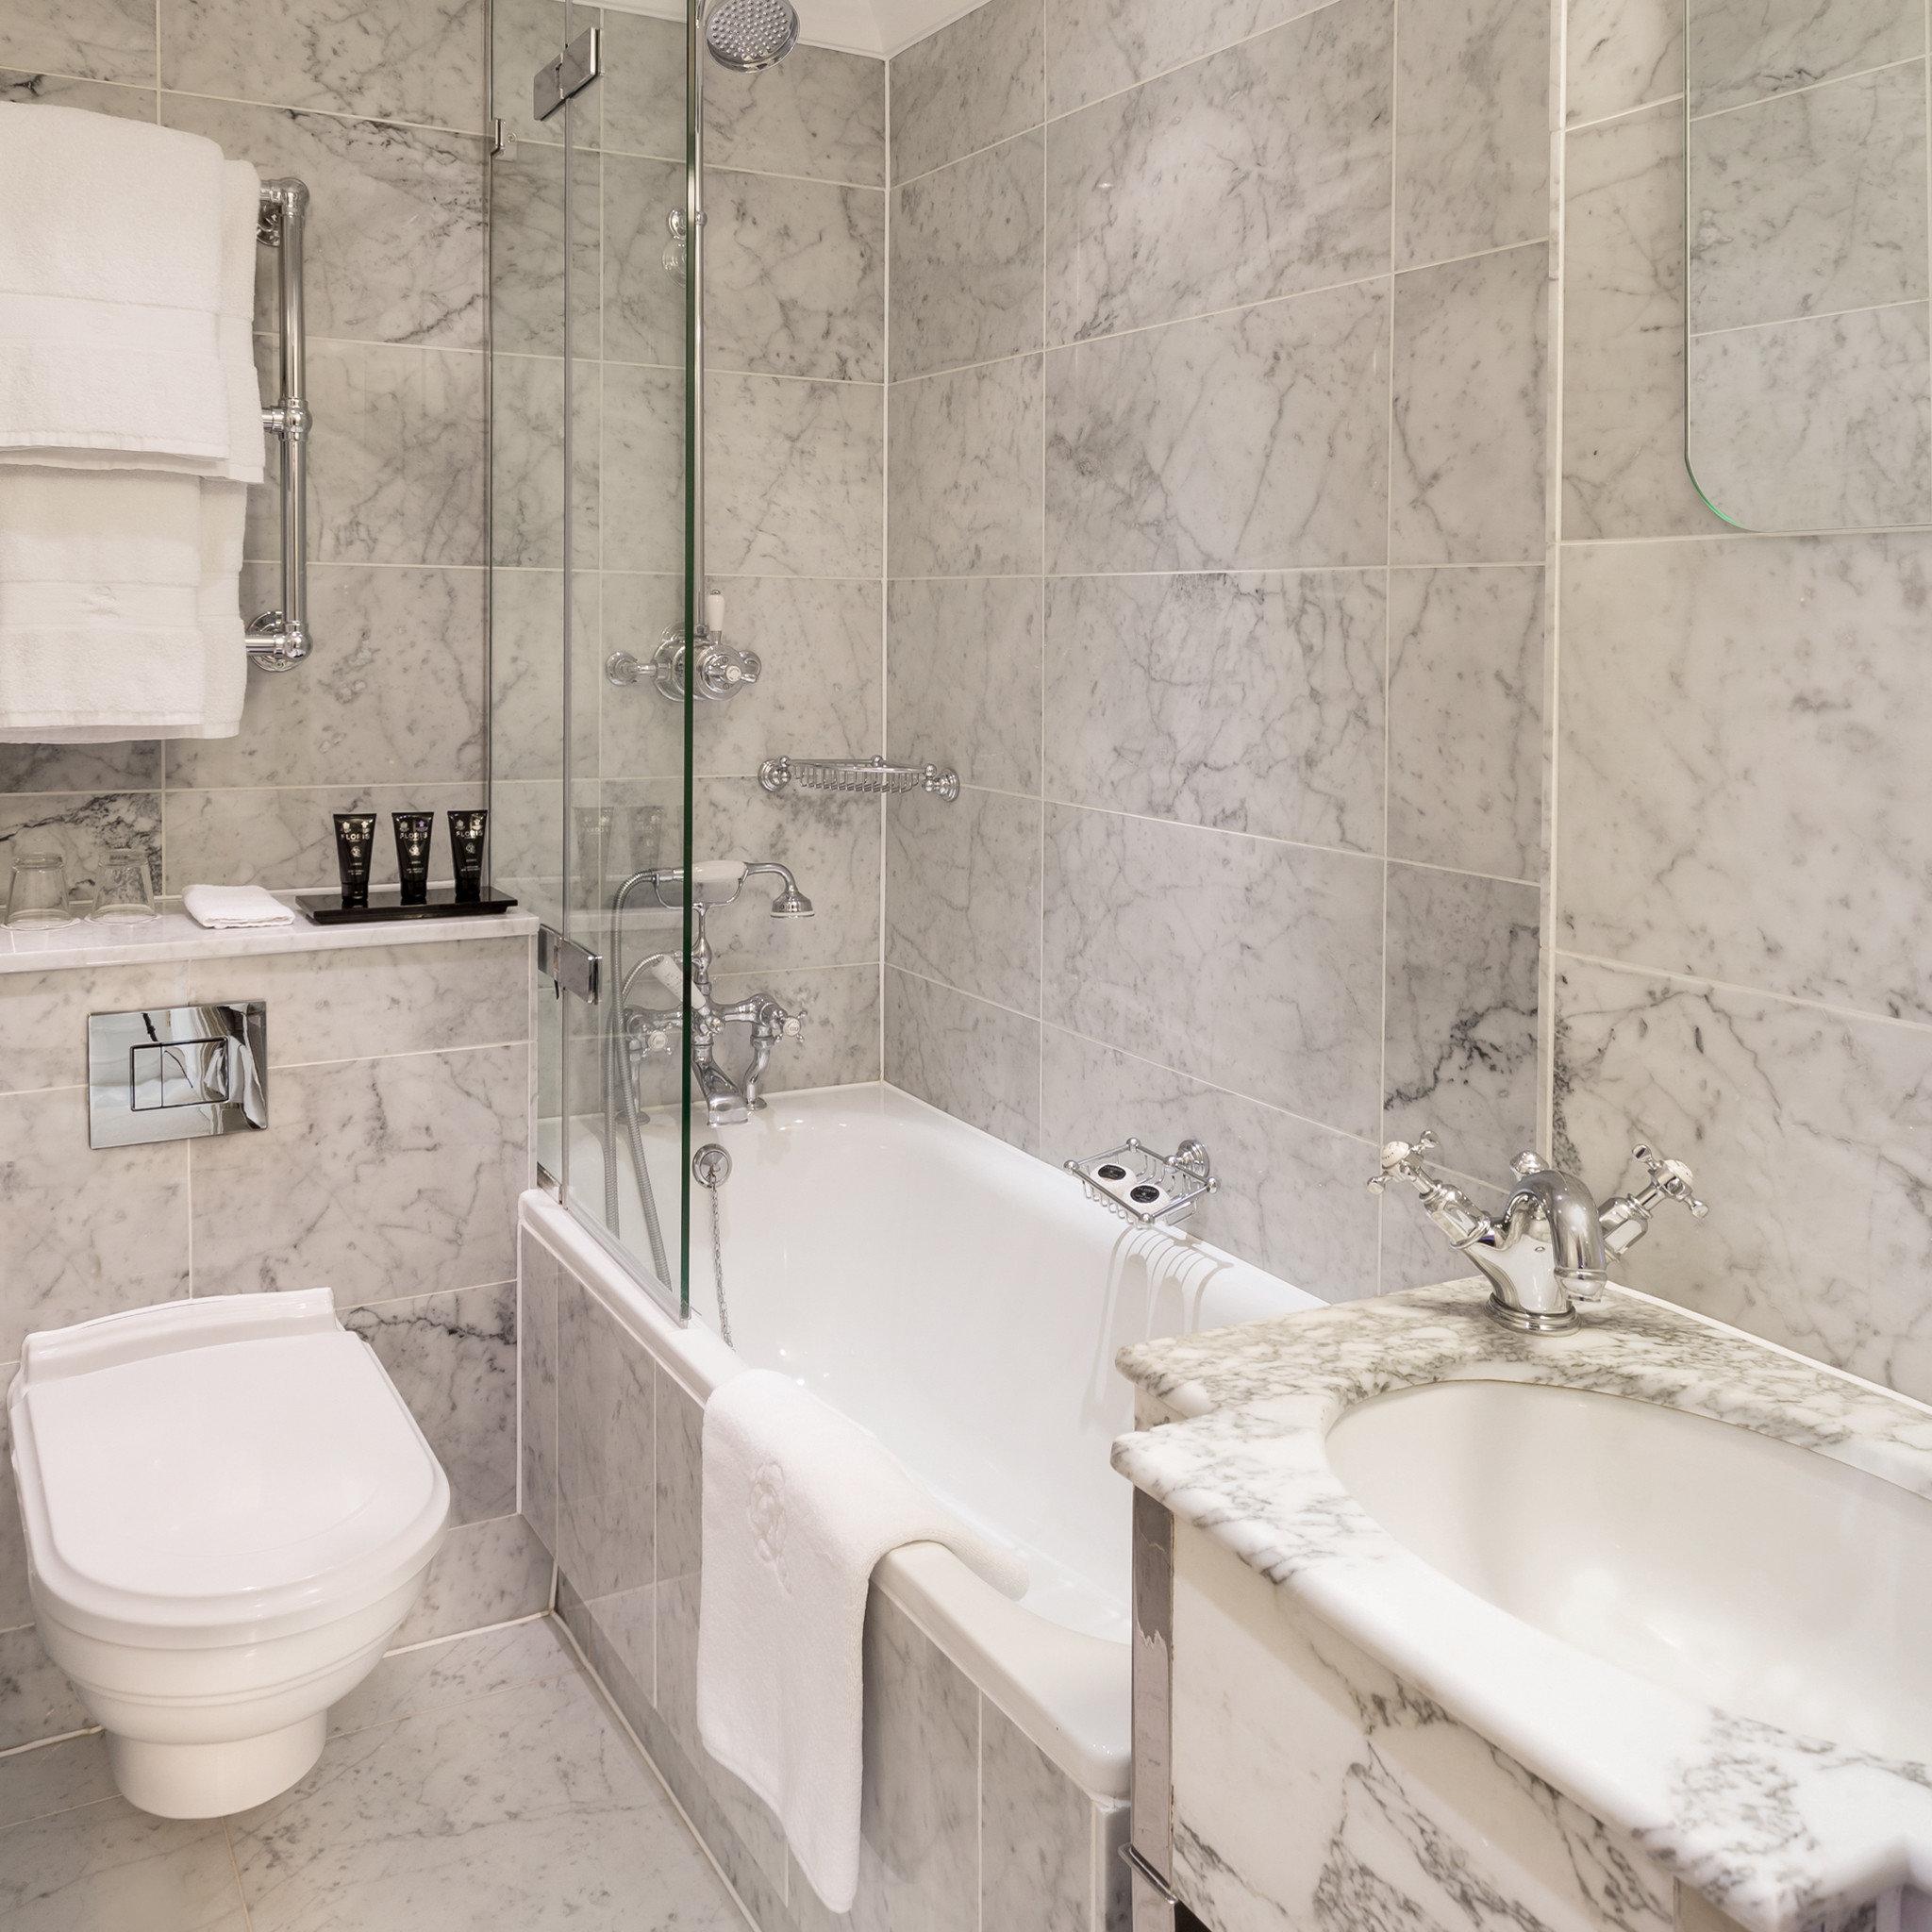 Bath Modern Resort bathroom white plumbing fixture tile bathtub bidet toilet flooring vessel tub tiled tan